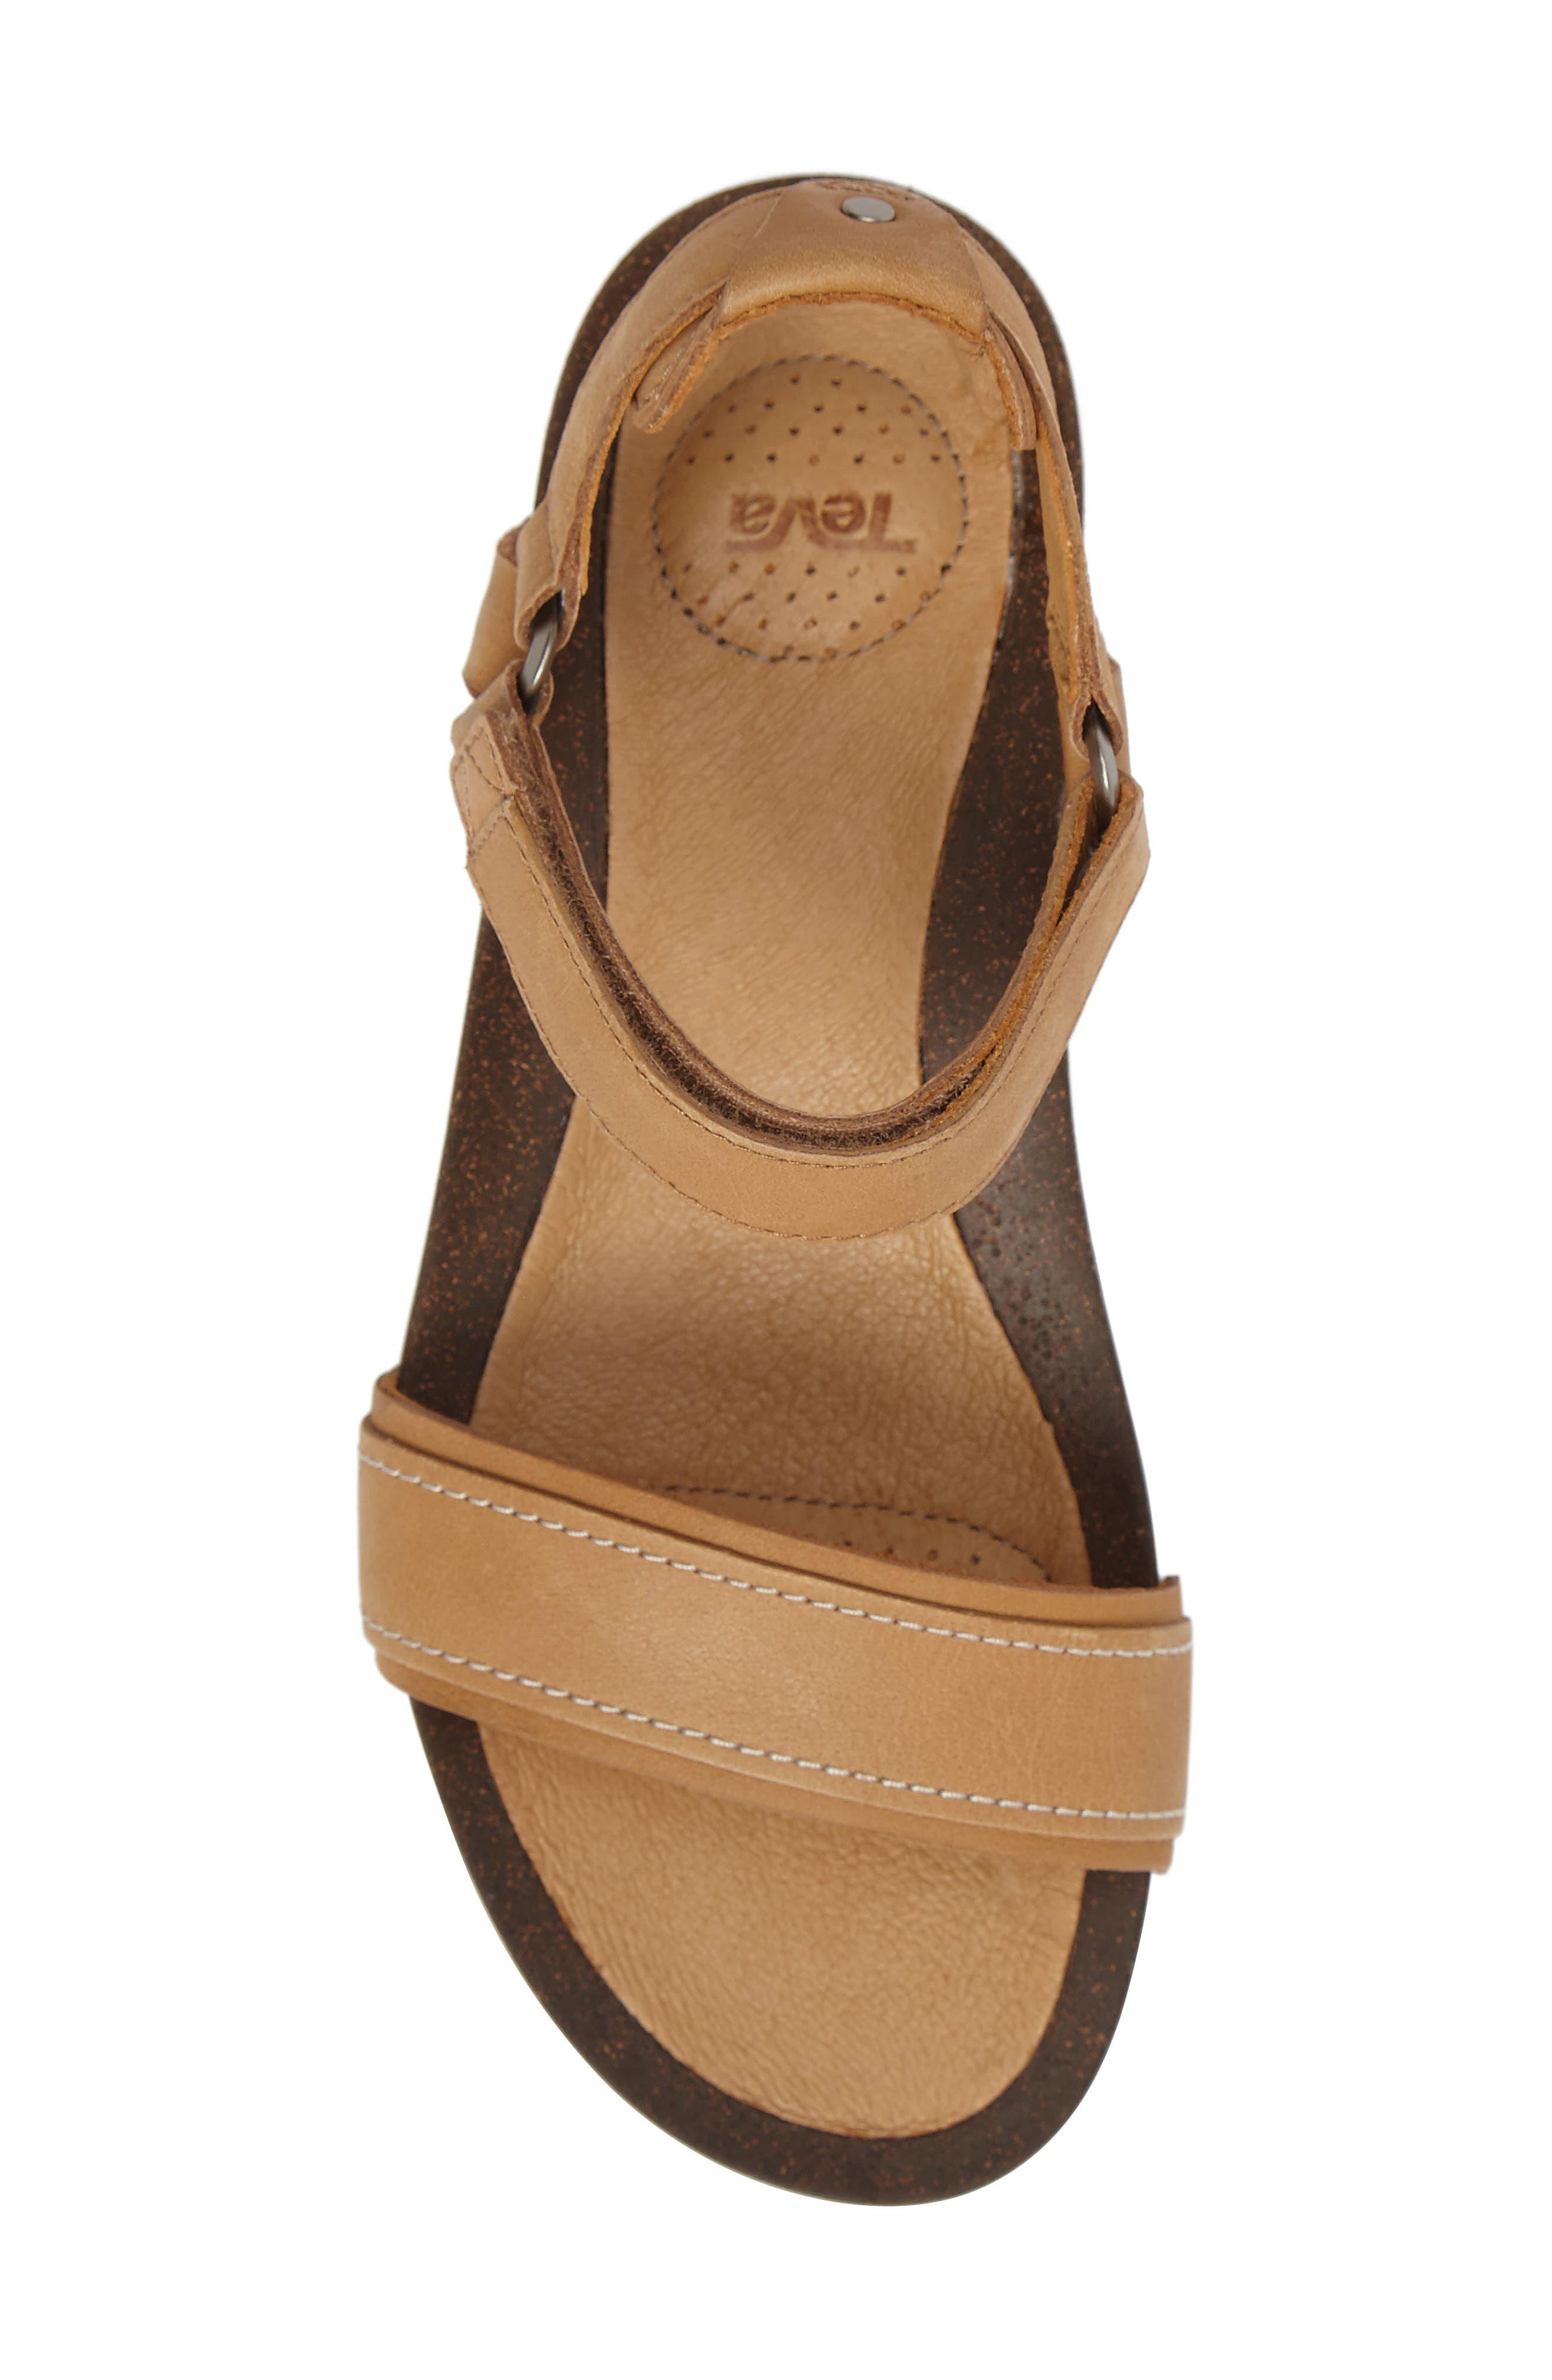 Ysidro Stitch Sandal,                             Alternate thumbnail 5, color,                             Tan Leather